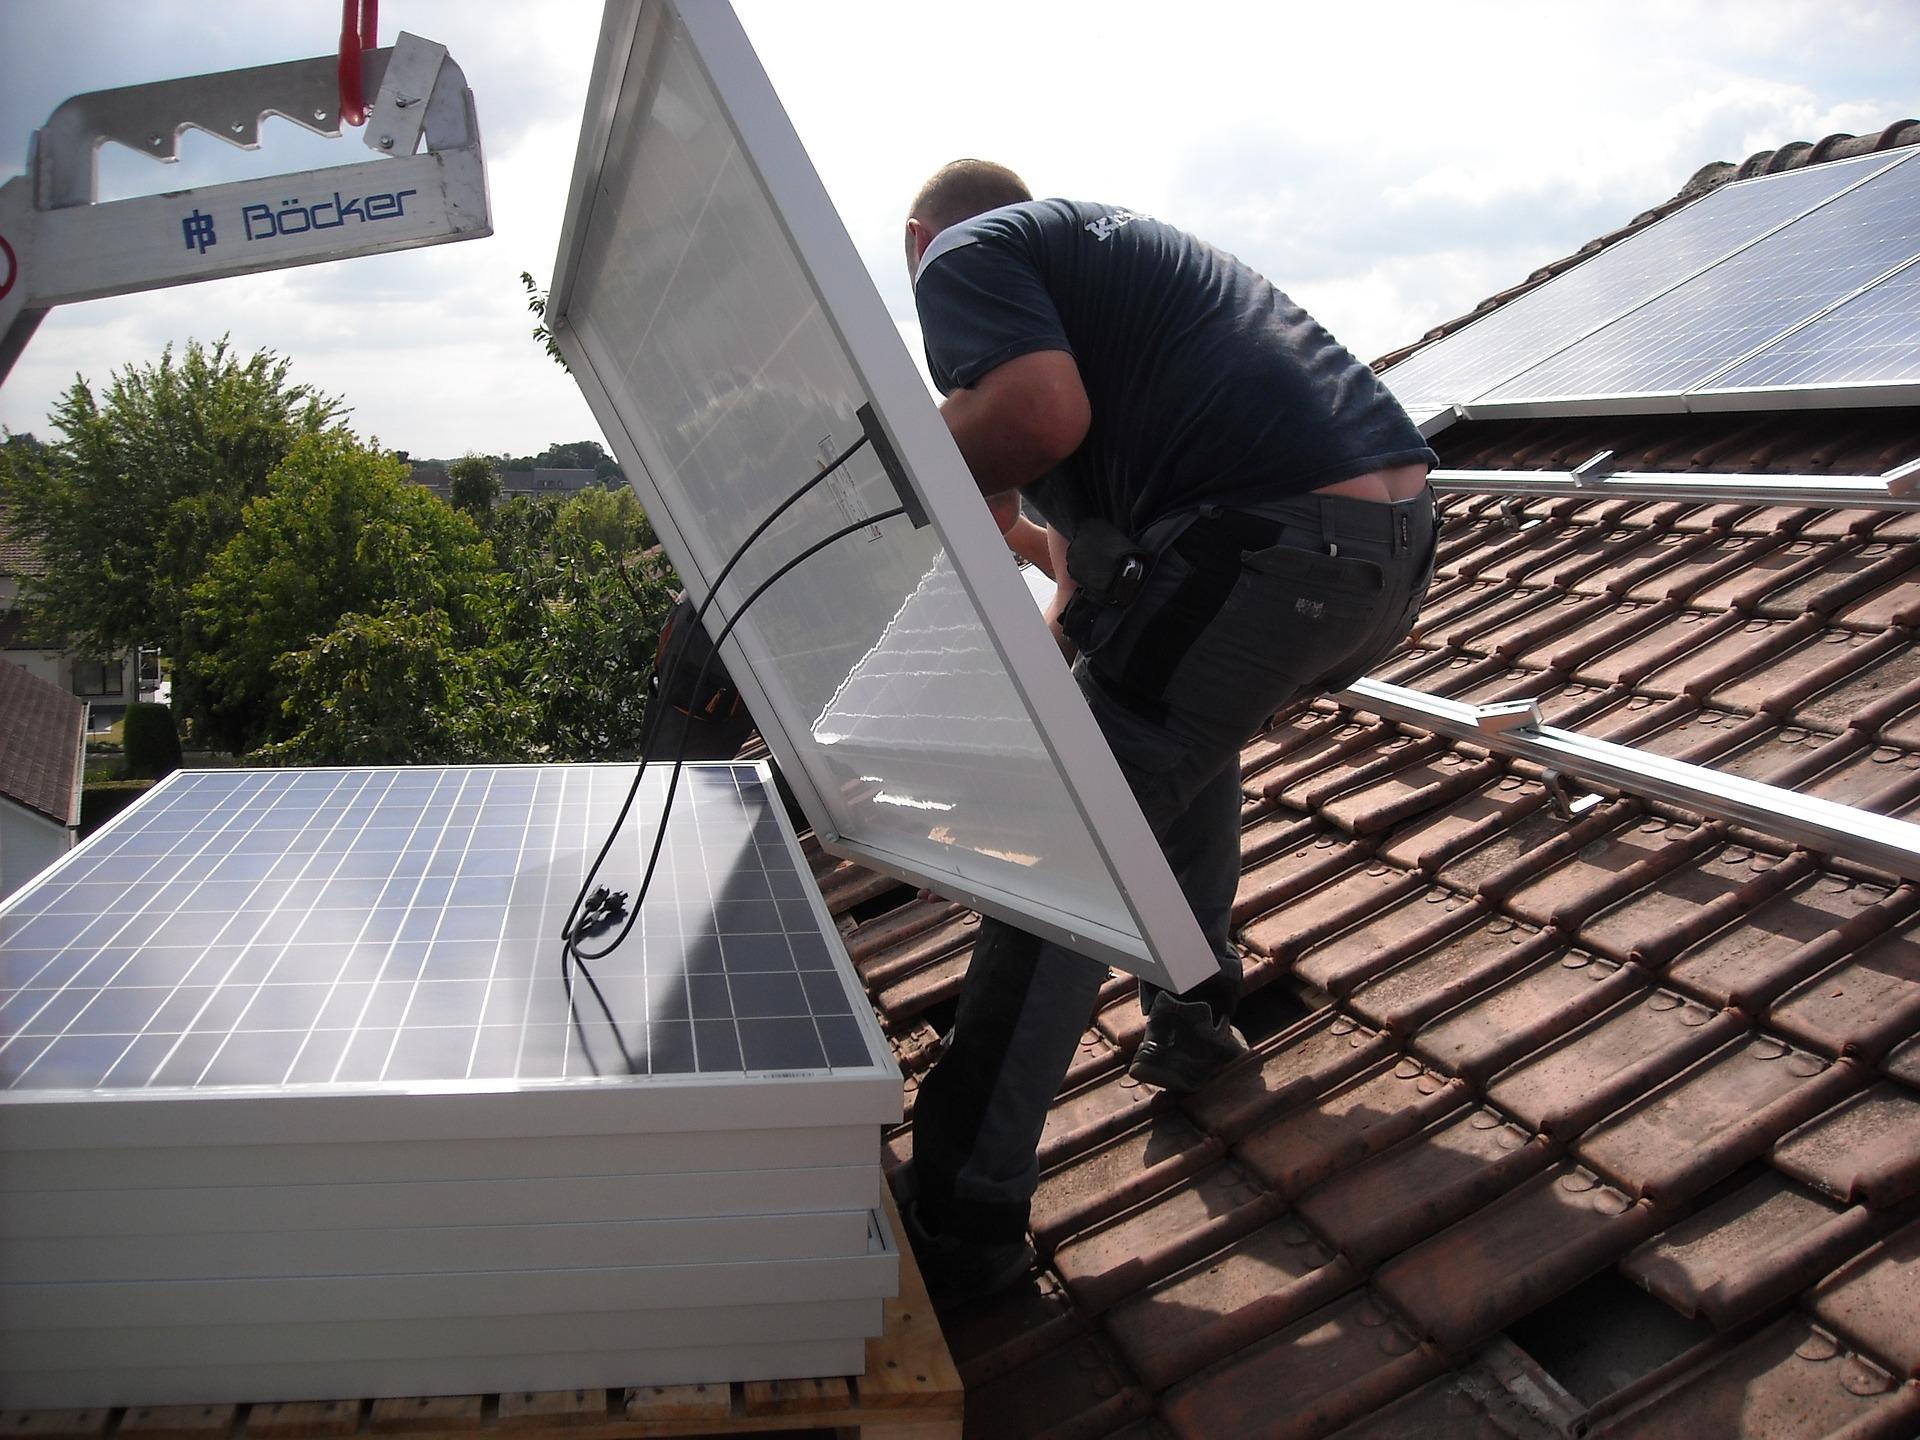 Монтаж солнечных панелей на крыше дома